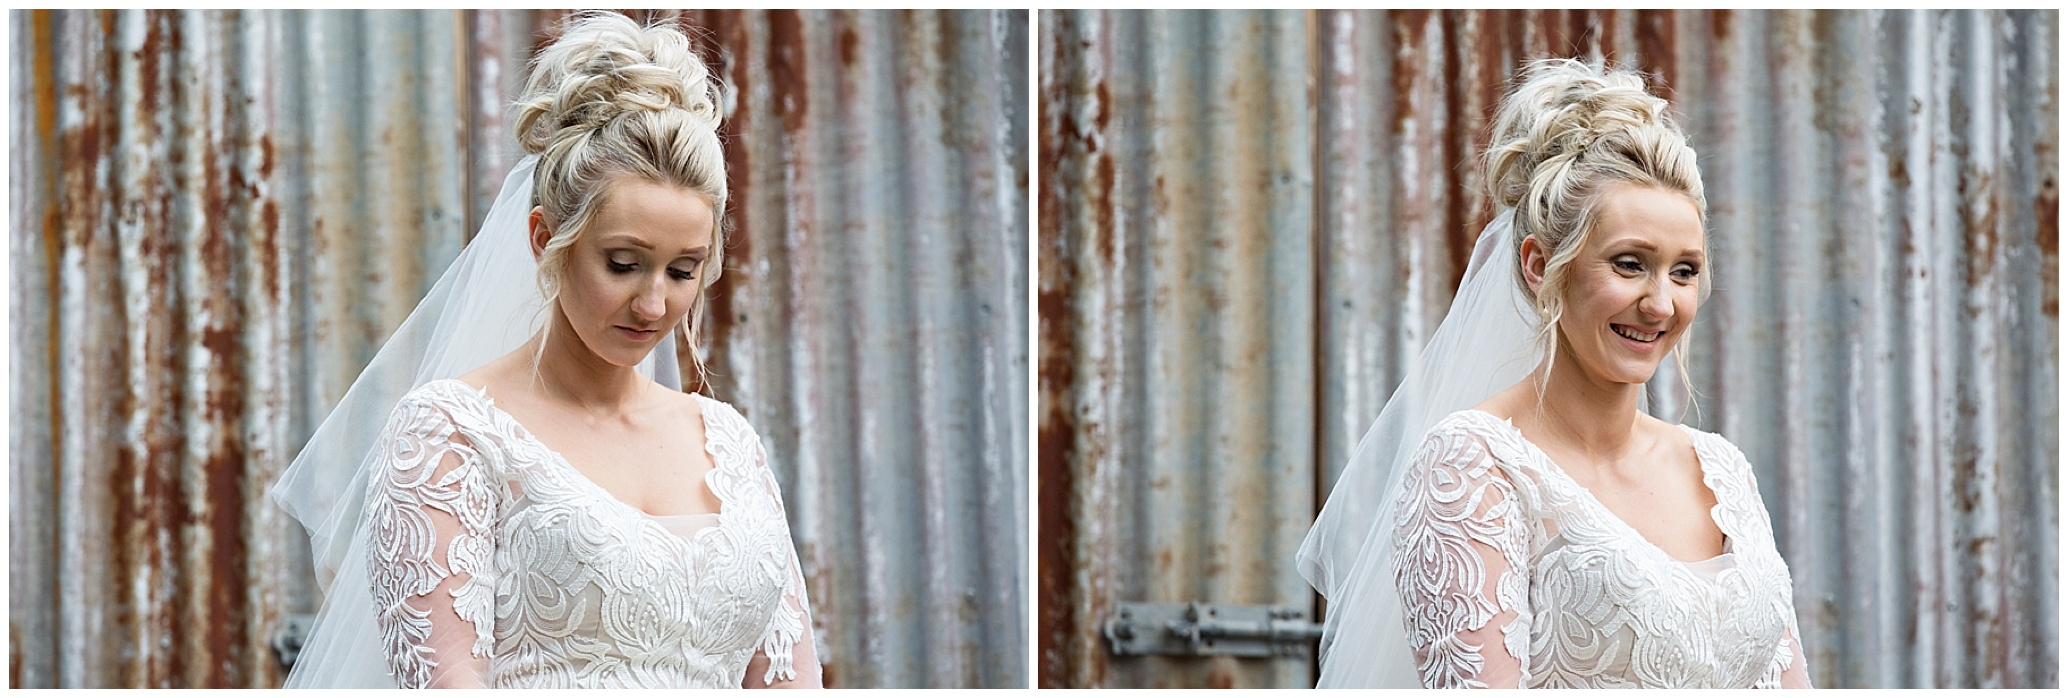 yarrawonga-wedding-photographer_0238.jpg